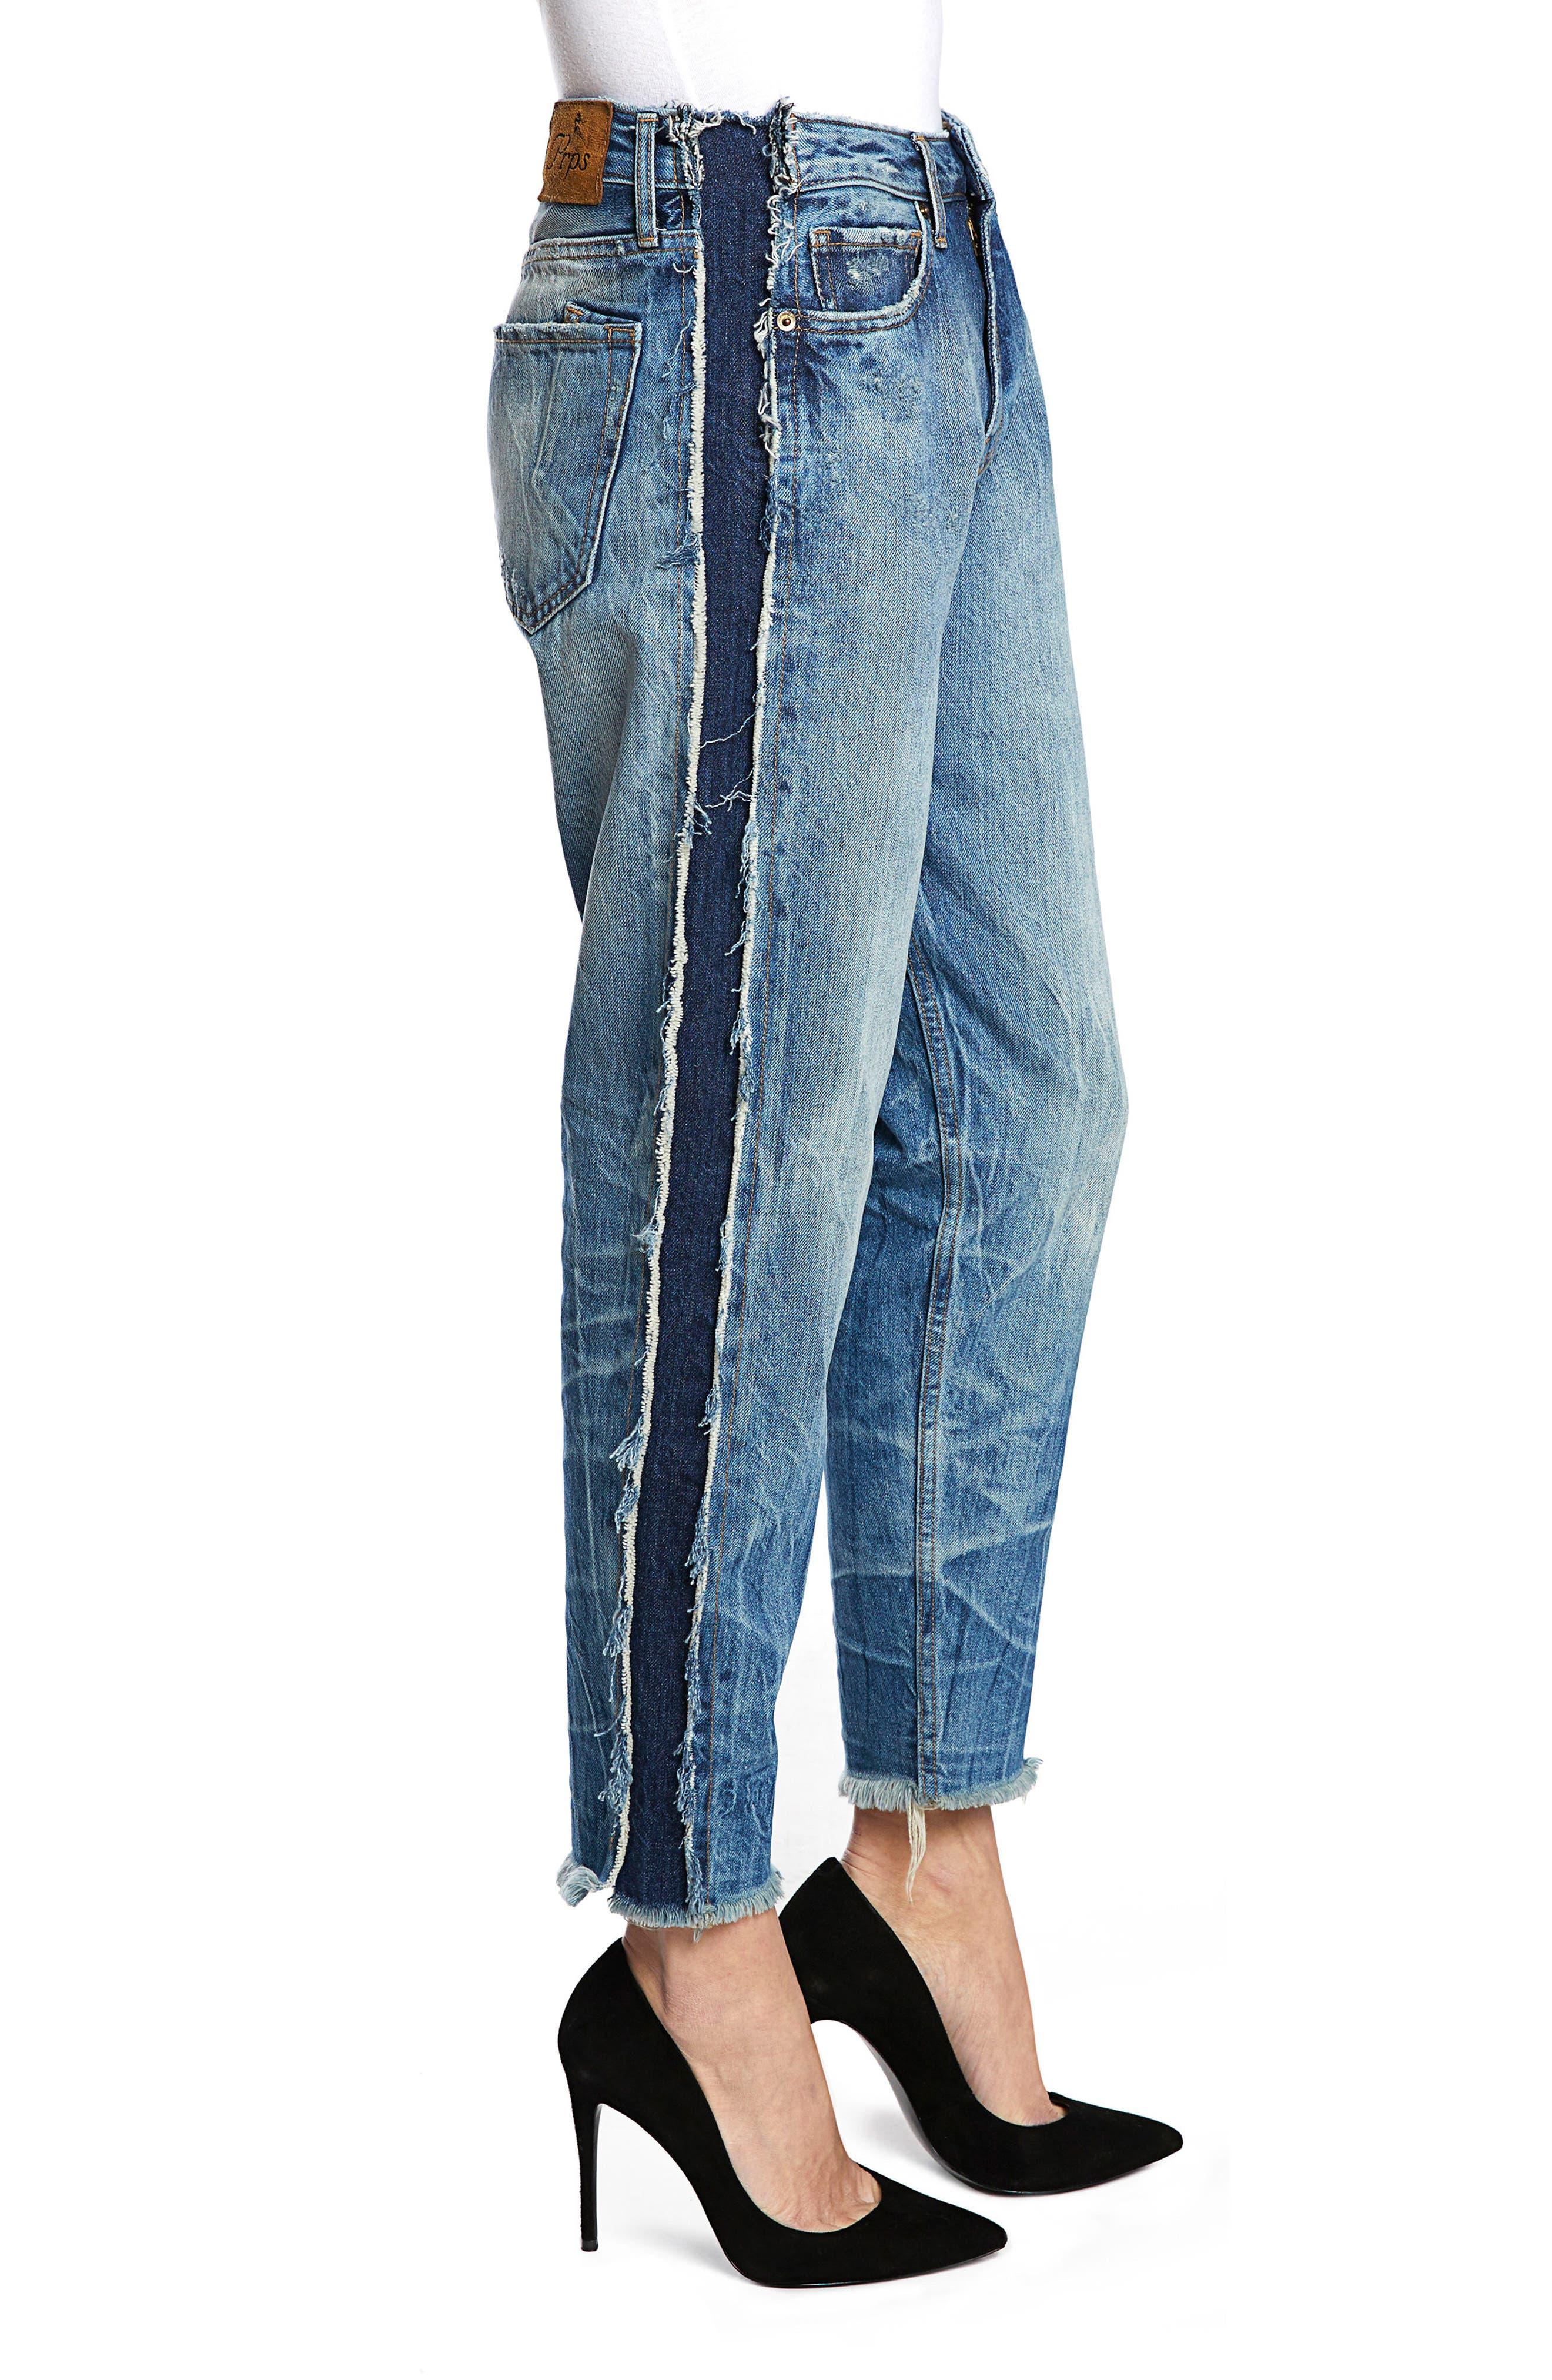 Bel Air High Waist Contrast Seam Boyfriend Jeans,                             Alternate thumbnail 3, color,                             490